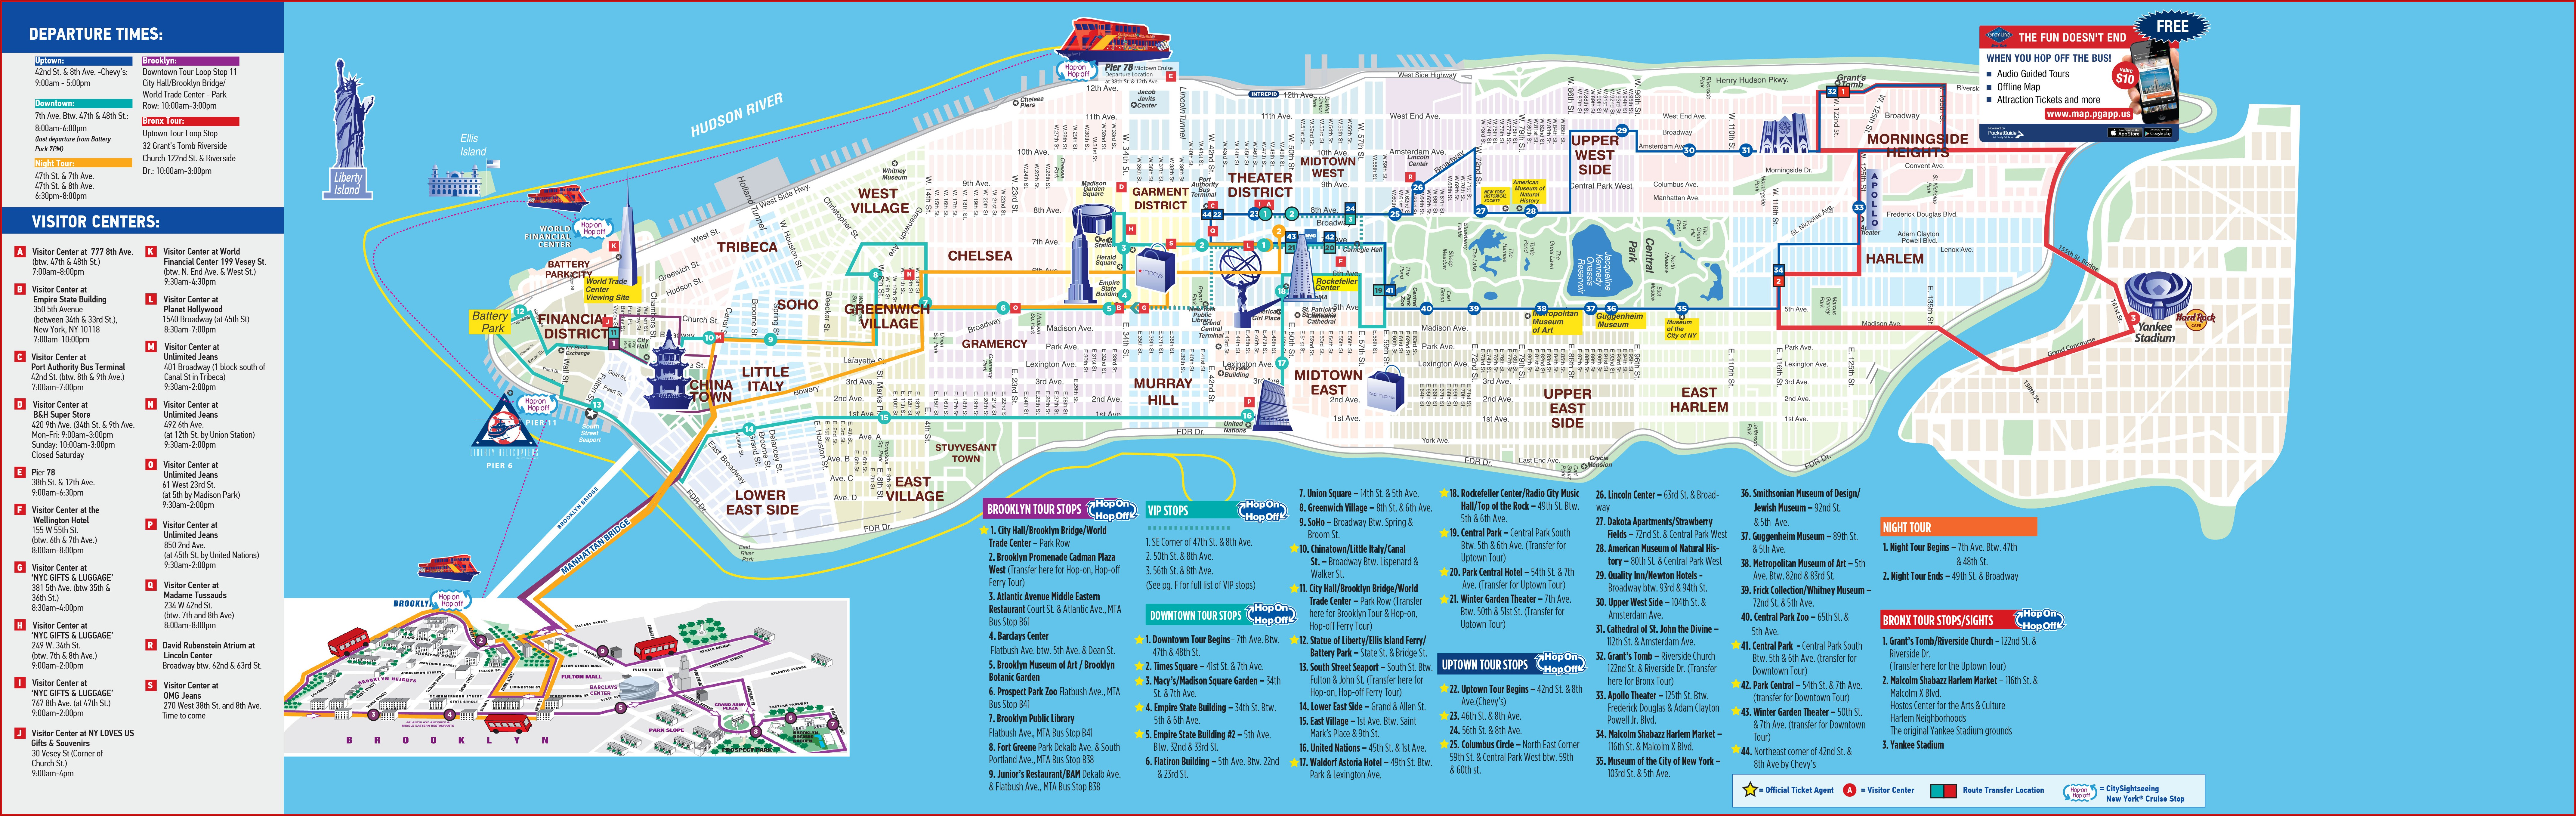 New York Pass Hop On Hop Off Bus Map